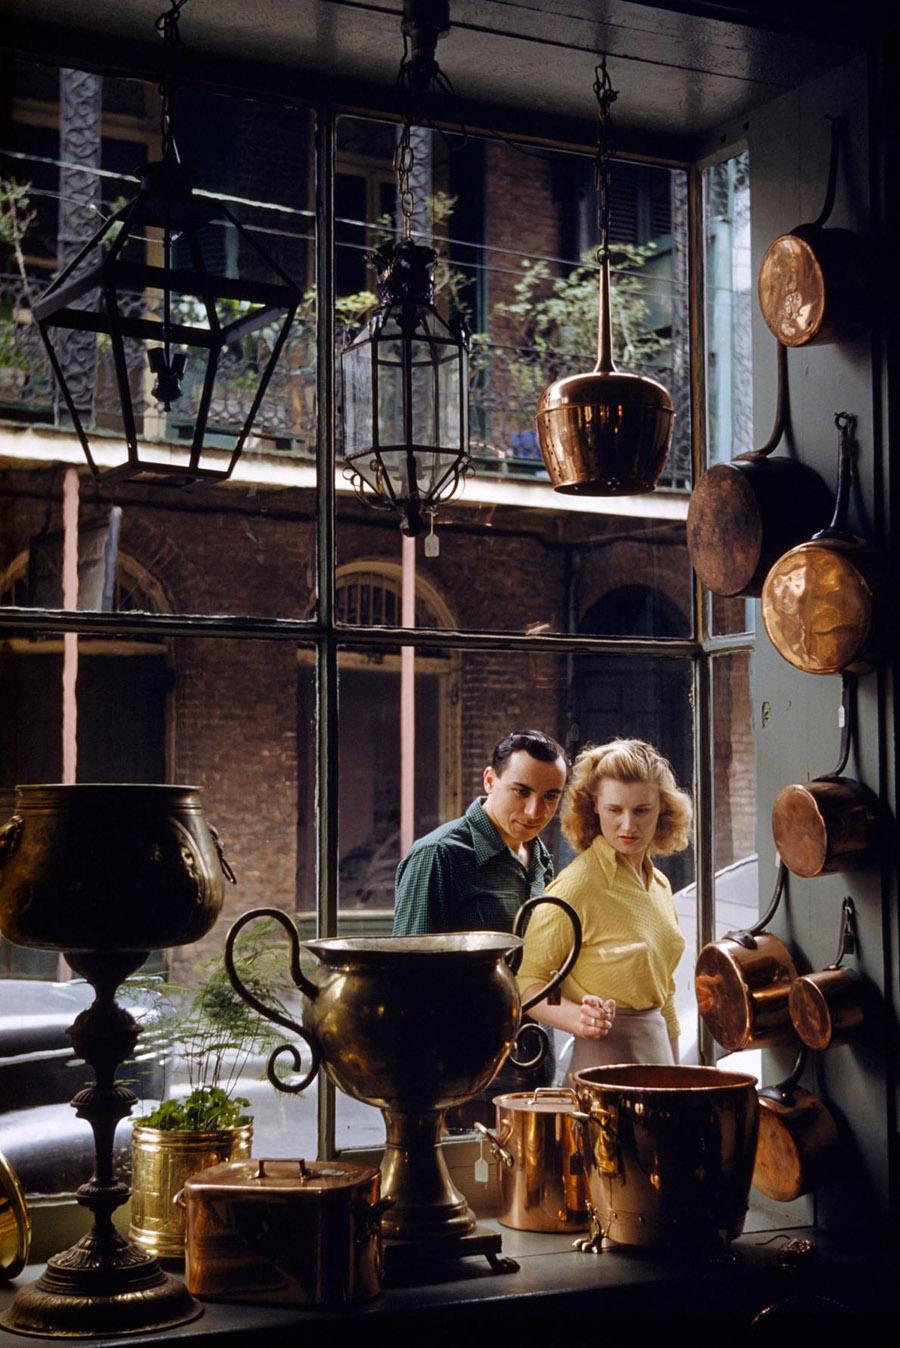 41-new-orleans-window-shopping-romance.adapt.1190.1.jpg